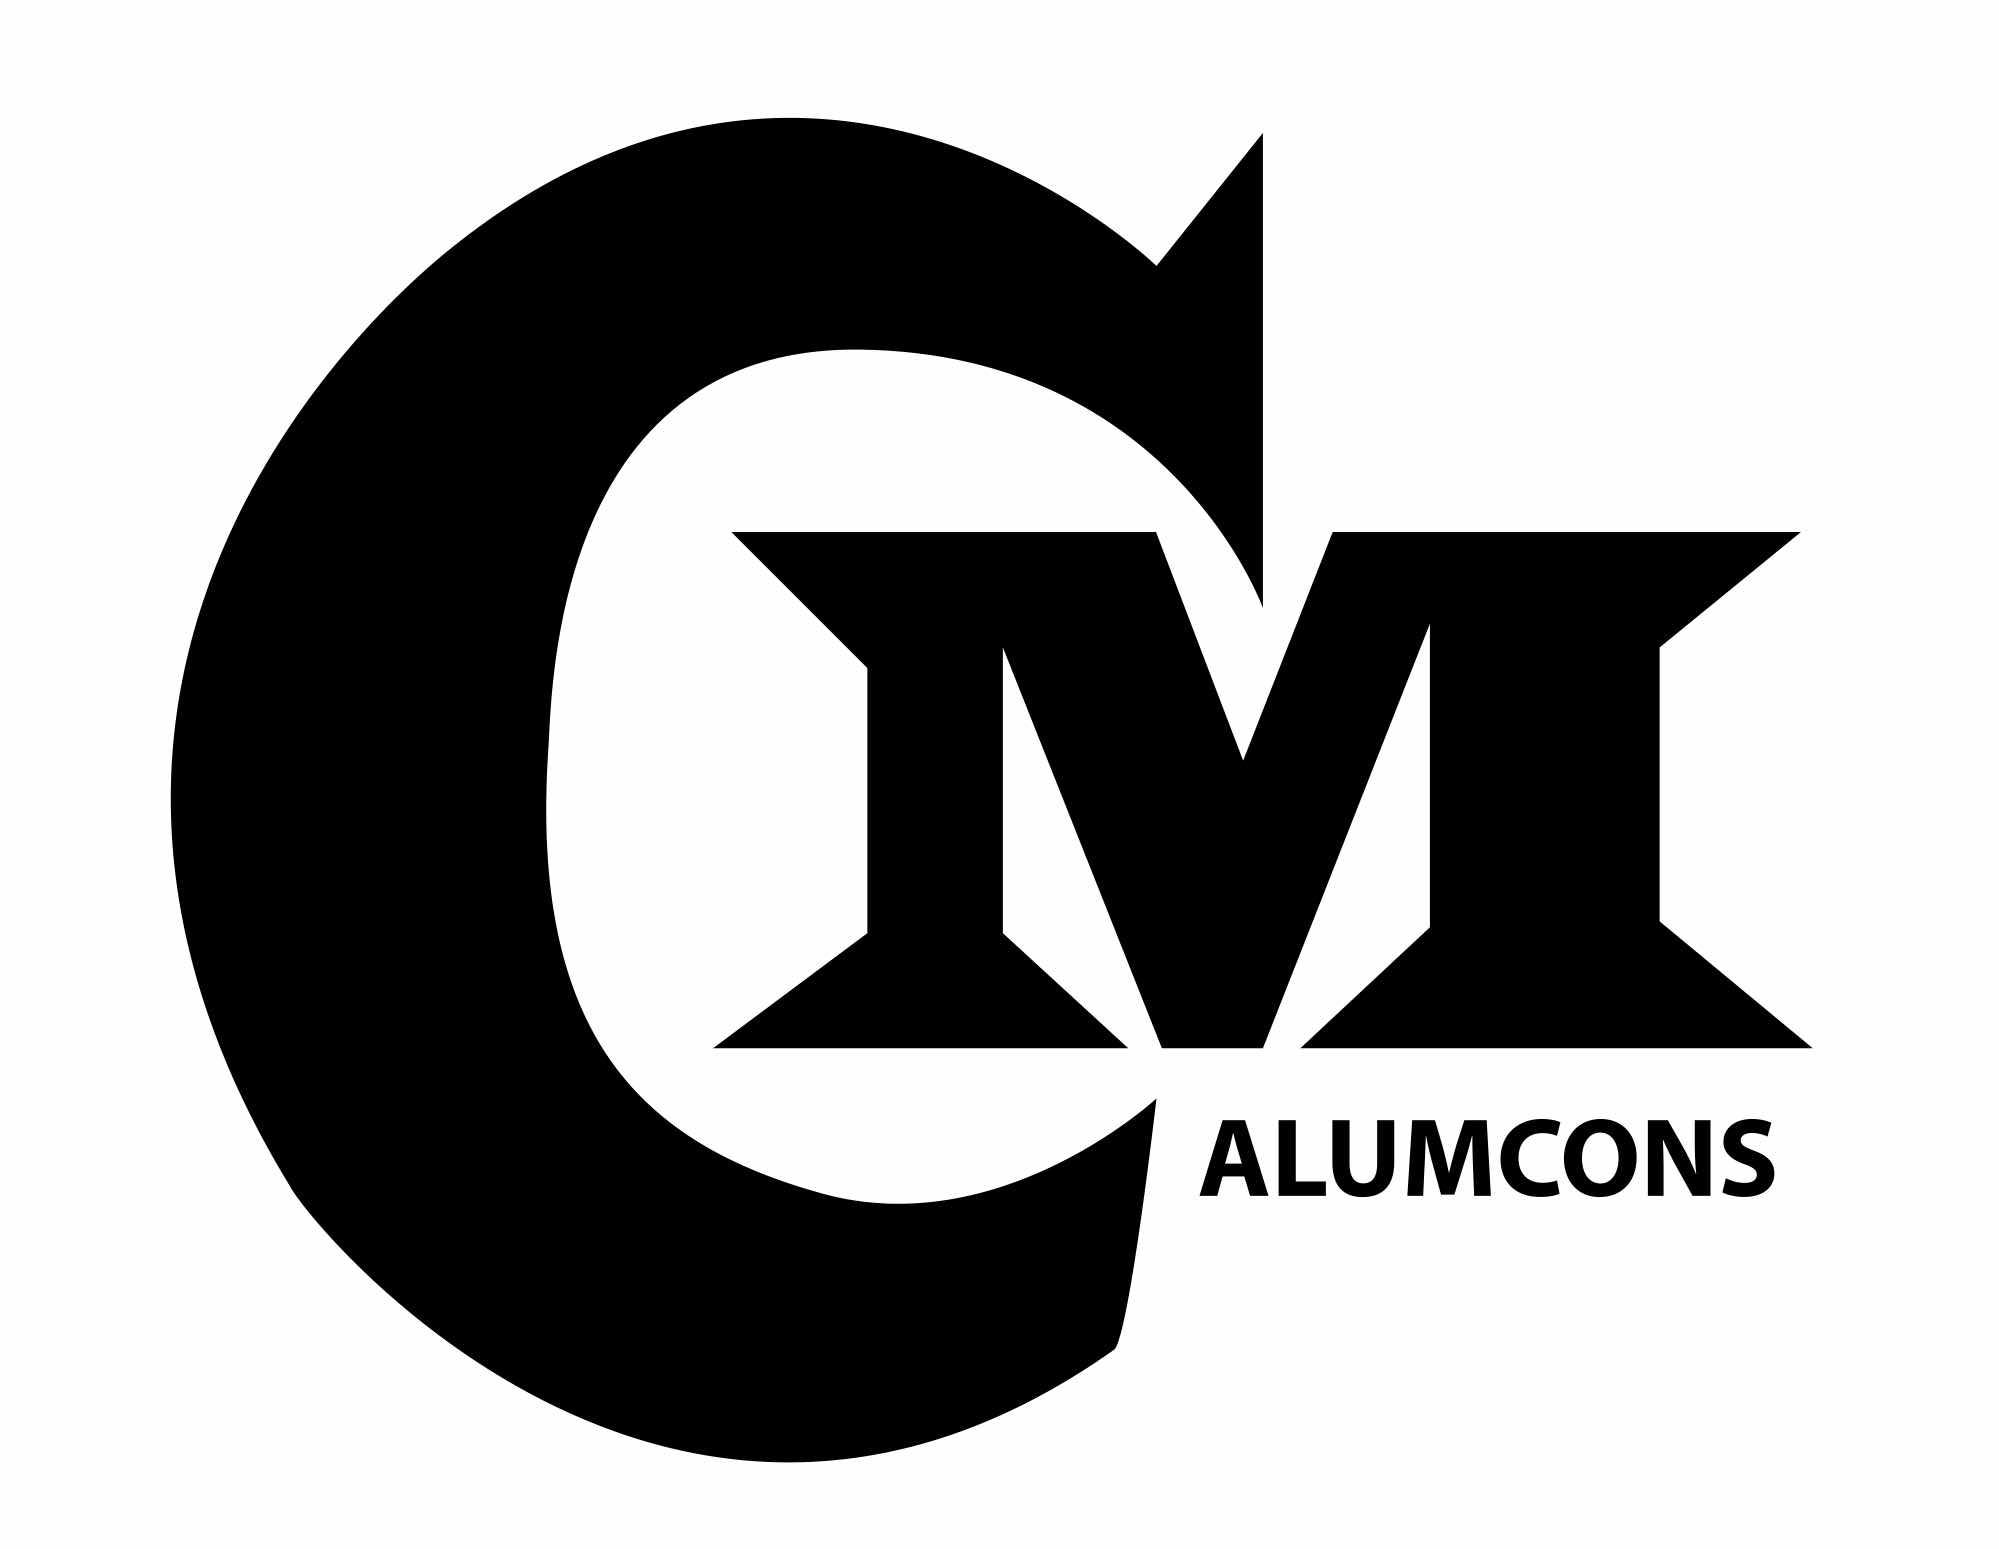 Cm Alumcons